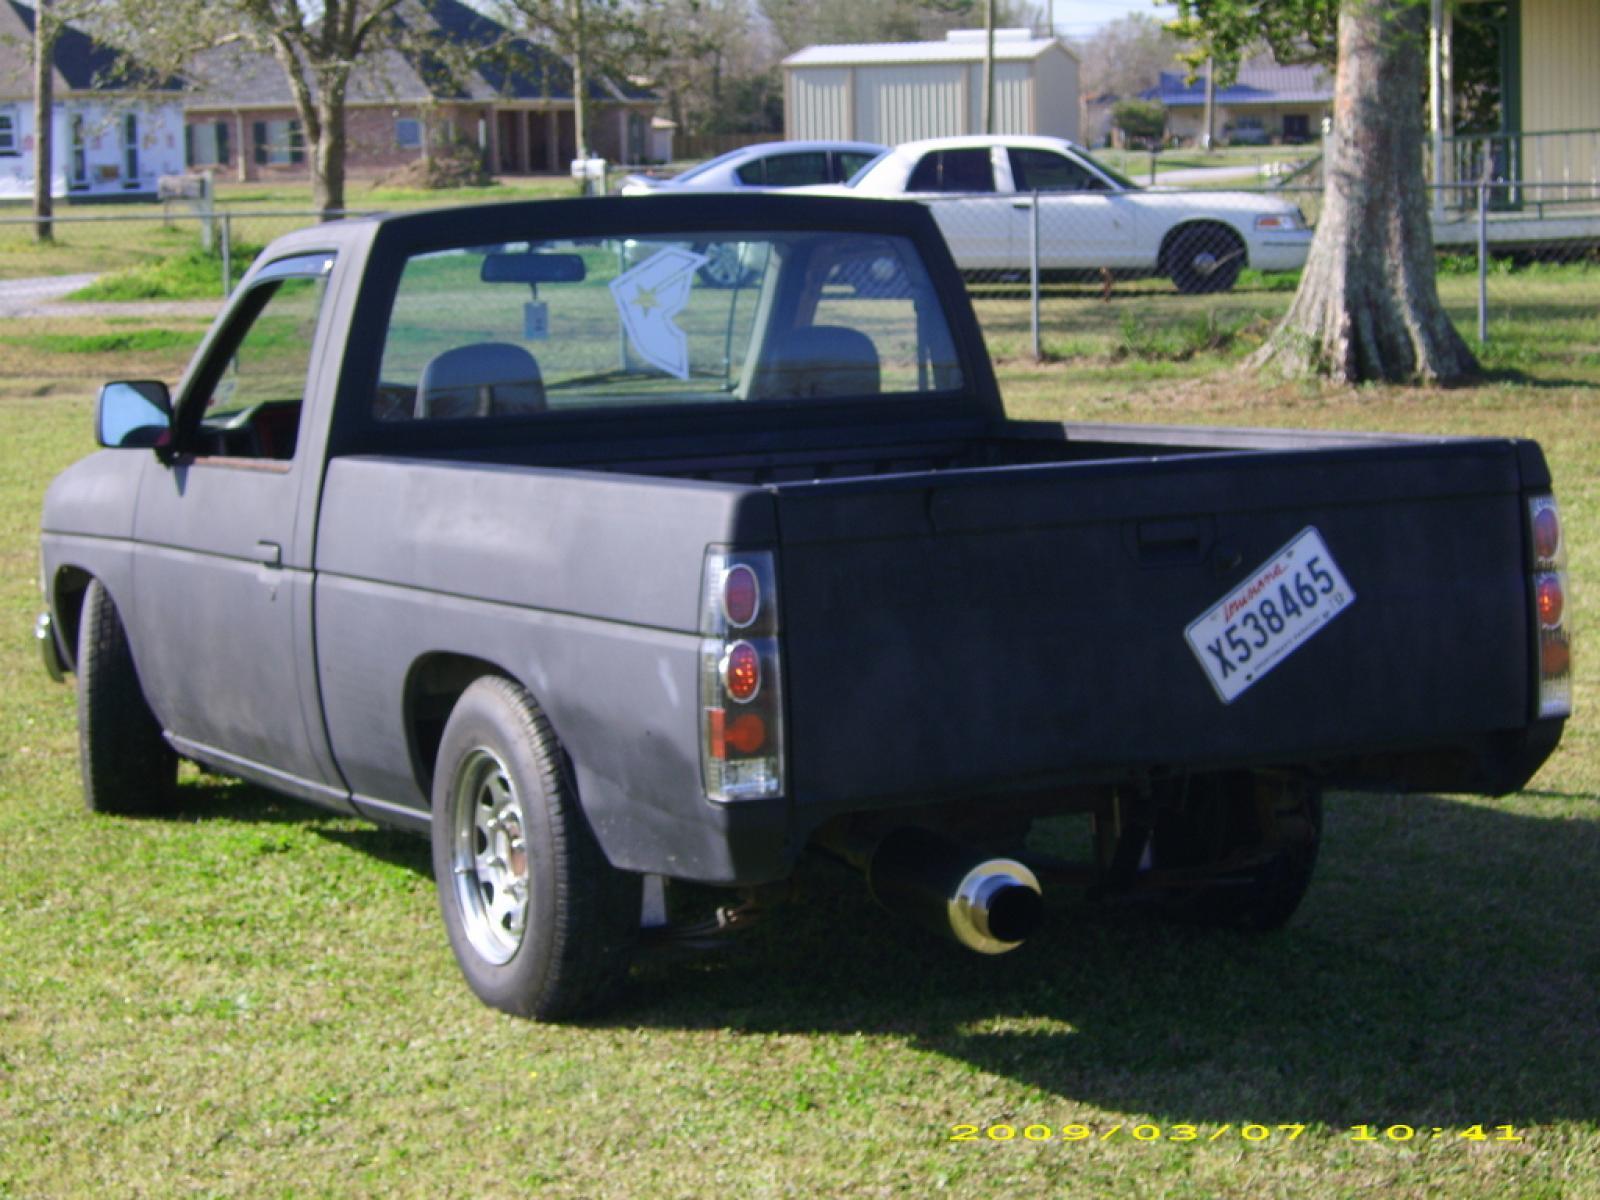 1991 Nissan Truck 1 800 1024 1280 1600 Origin